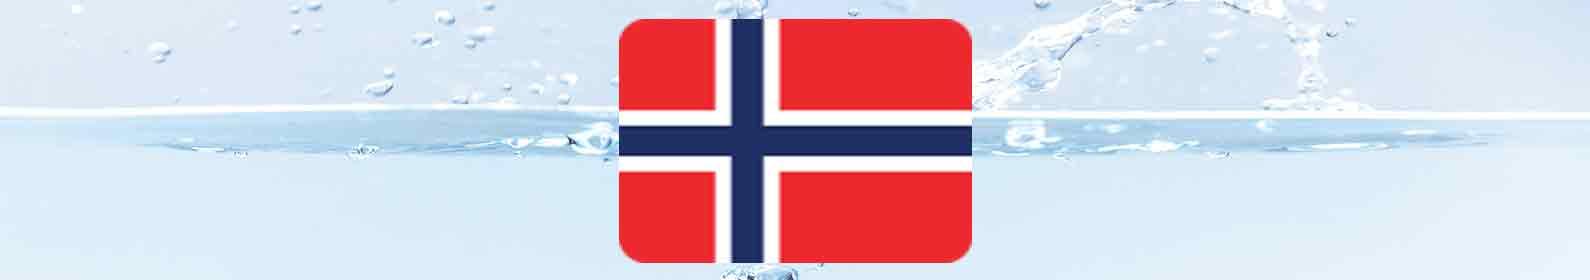 tratamento-de-agua-noruega.jpg